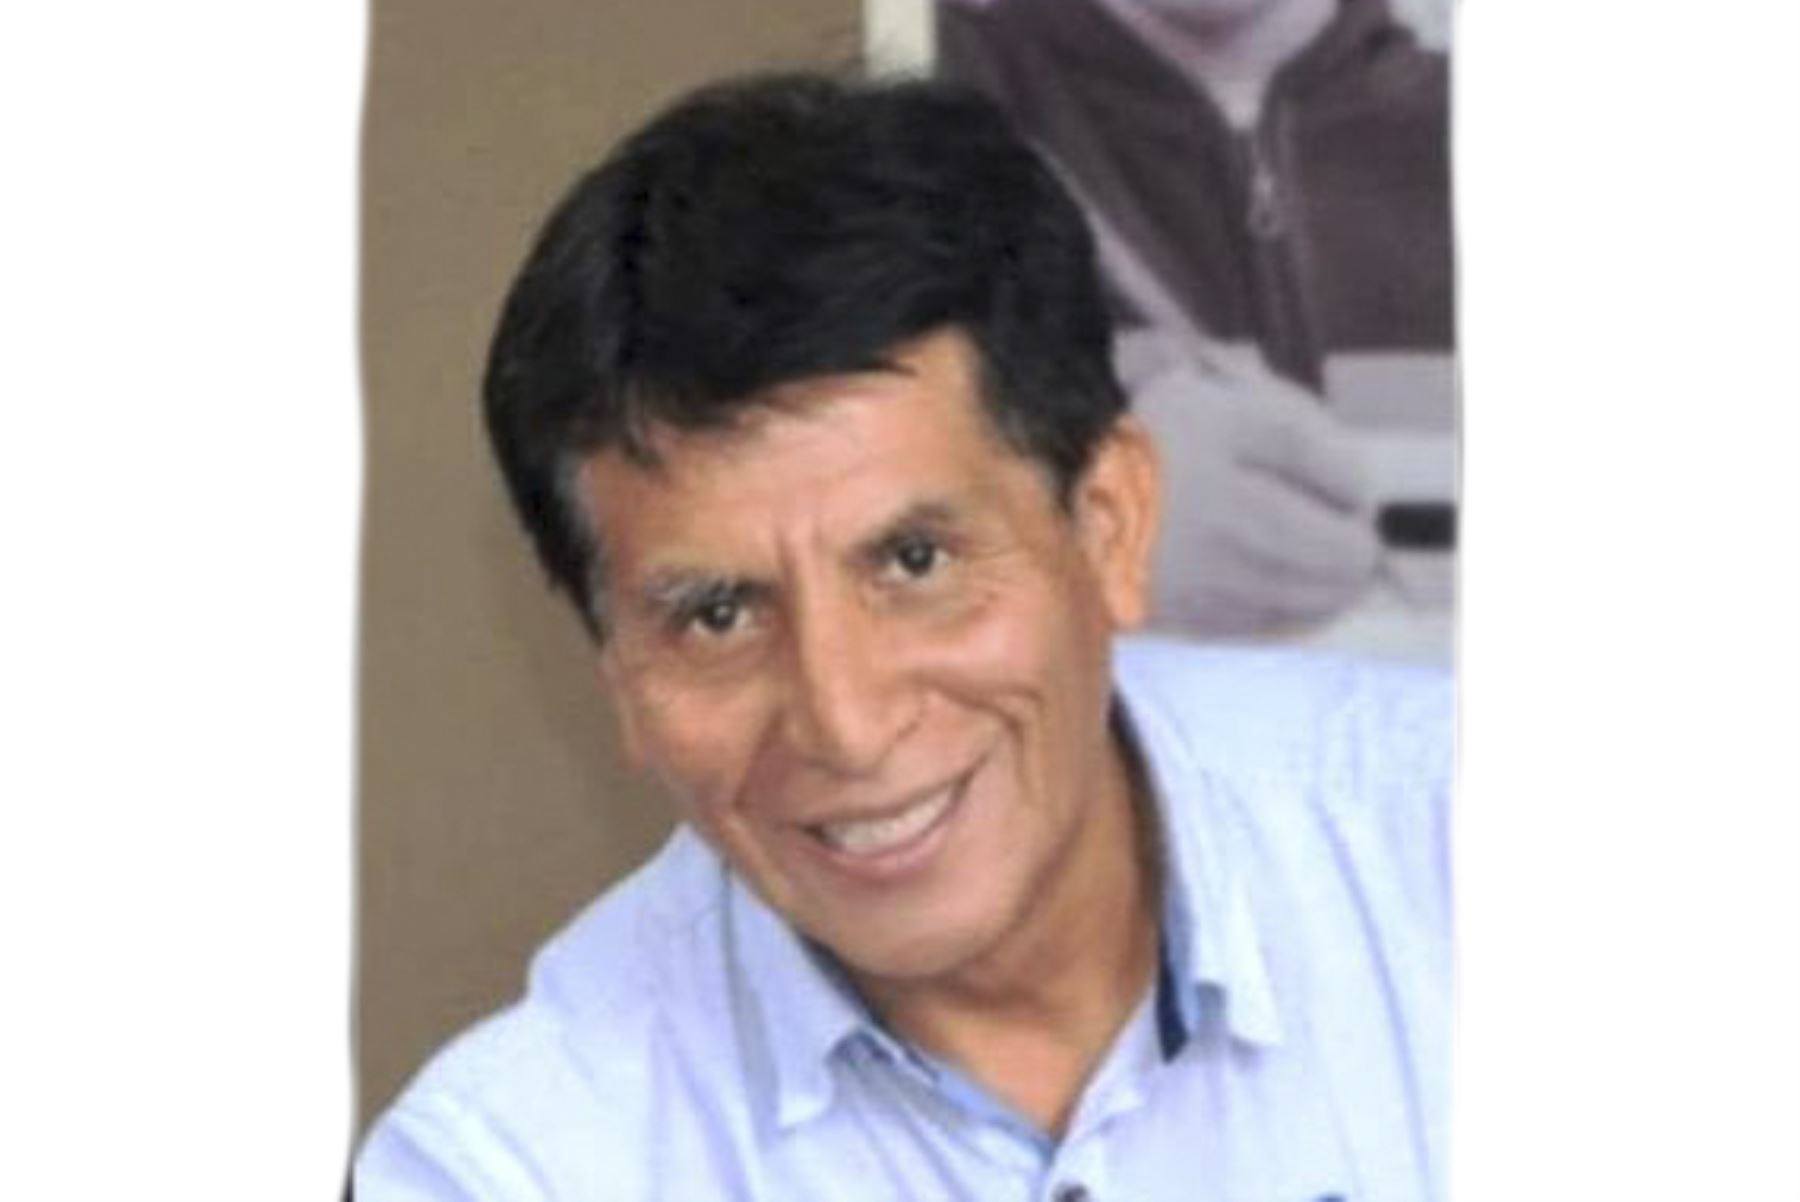 El jefe de la Unidad Territorial de Foncodes La Libertad, Eberth Flores Gonzales, desapareció el 24 de febrero en Cajamarca. Foto: ANDINA/Difusión